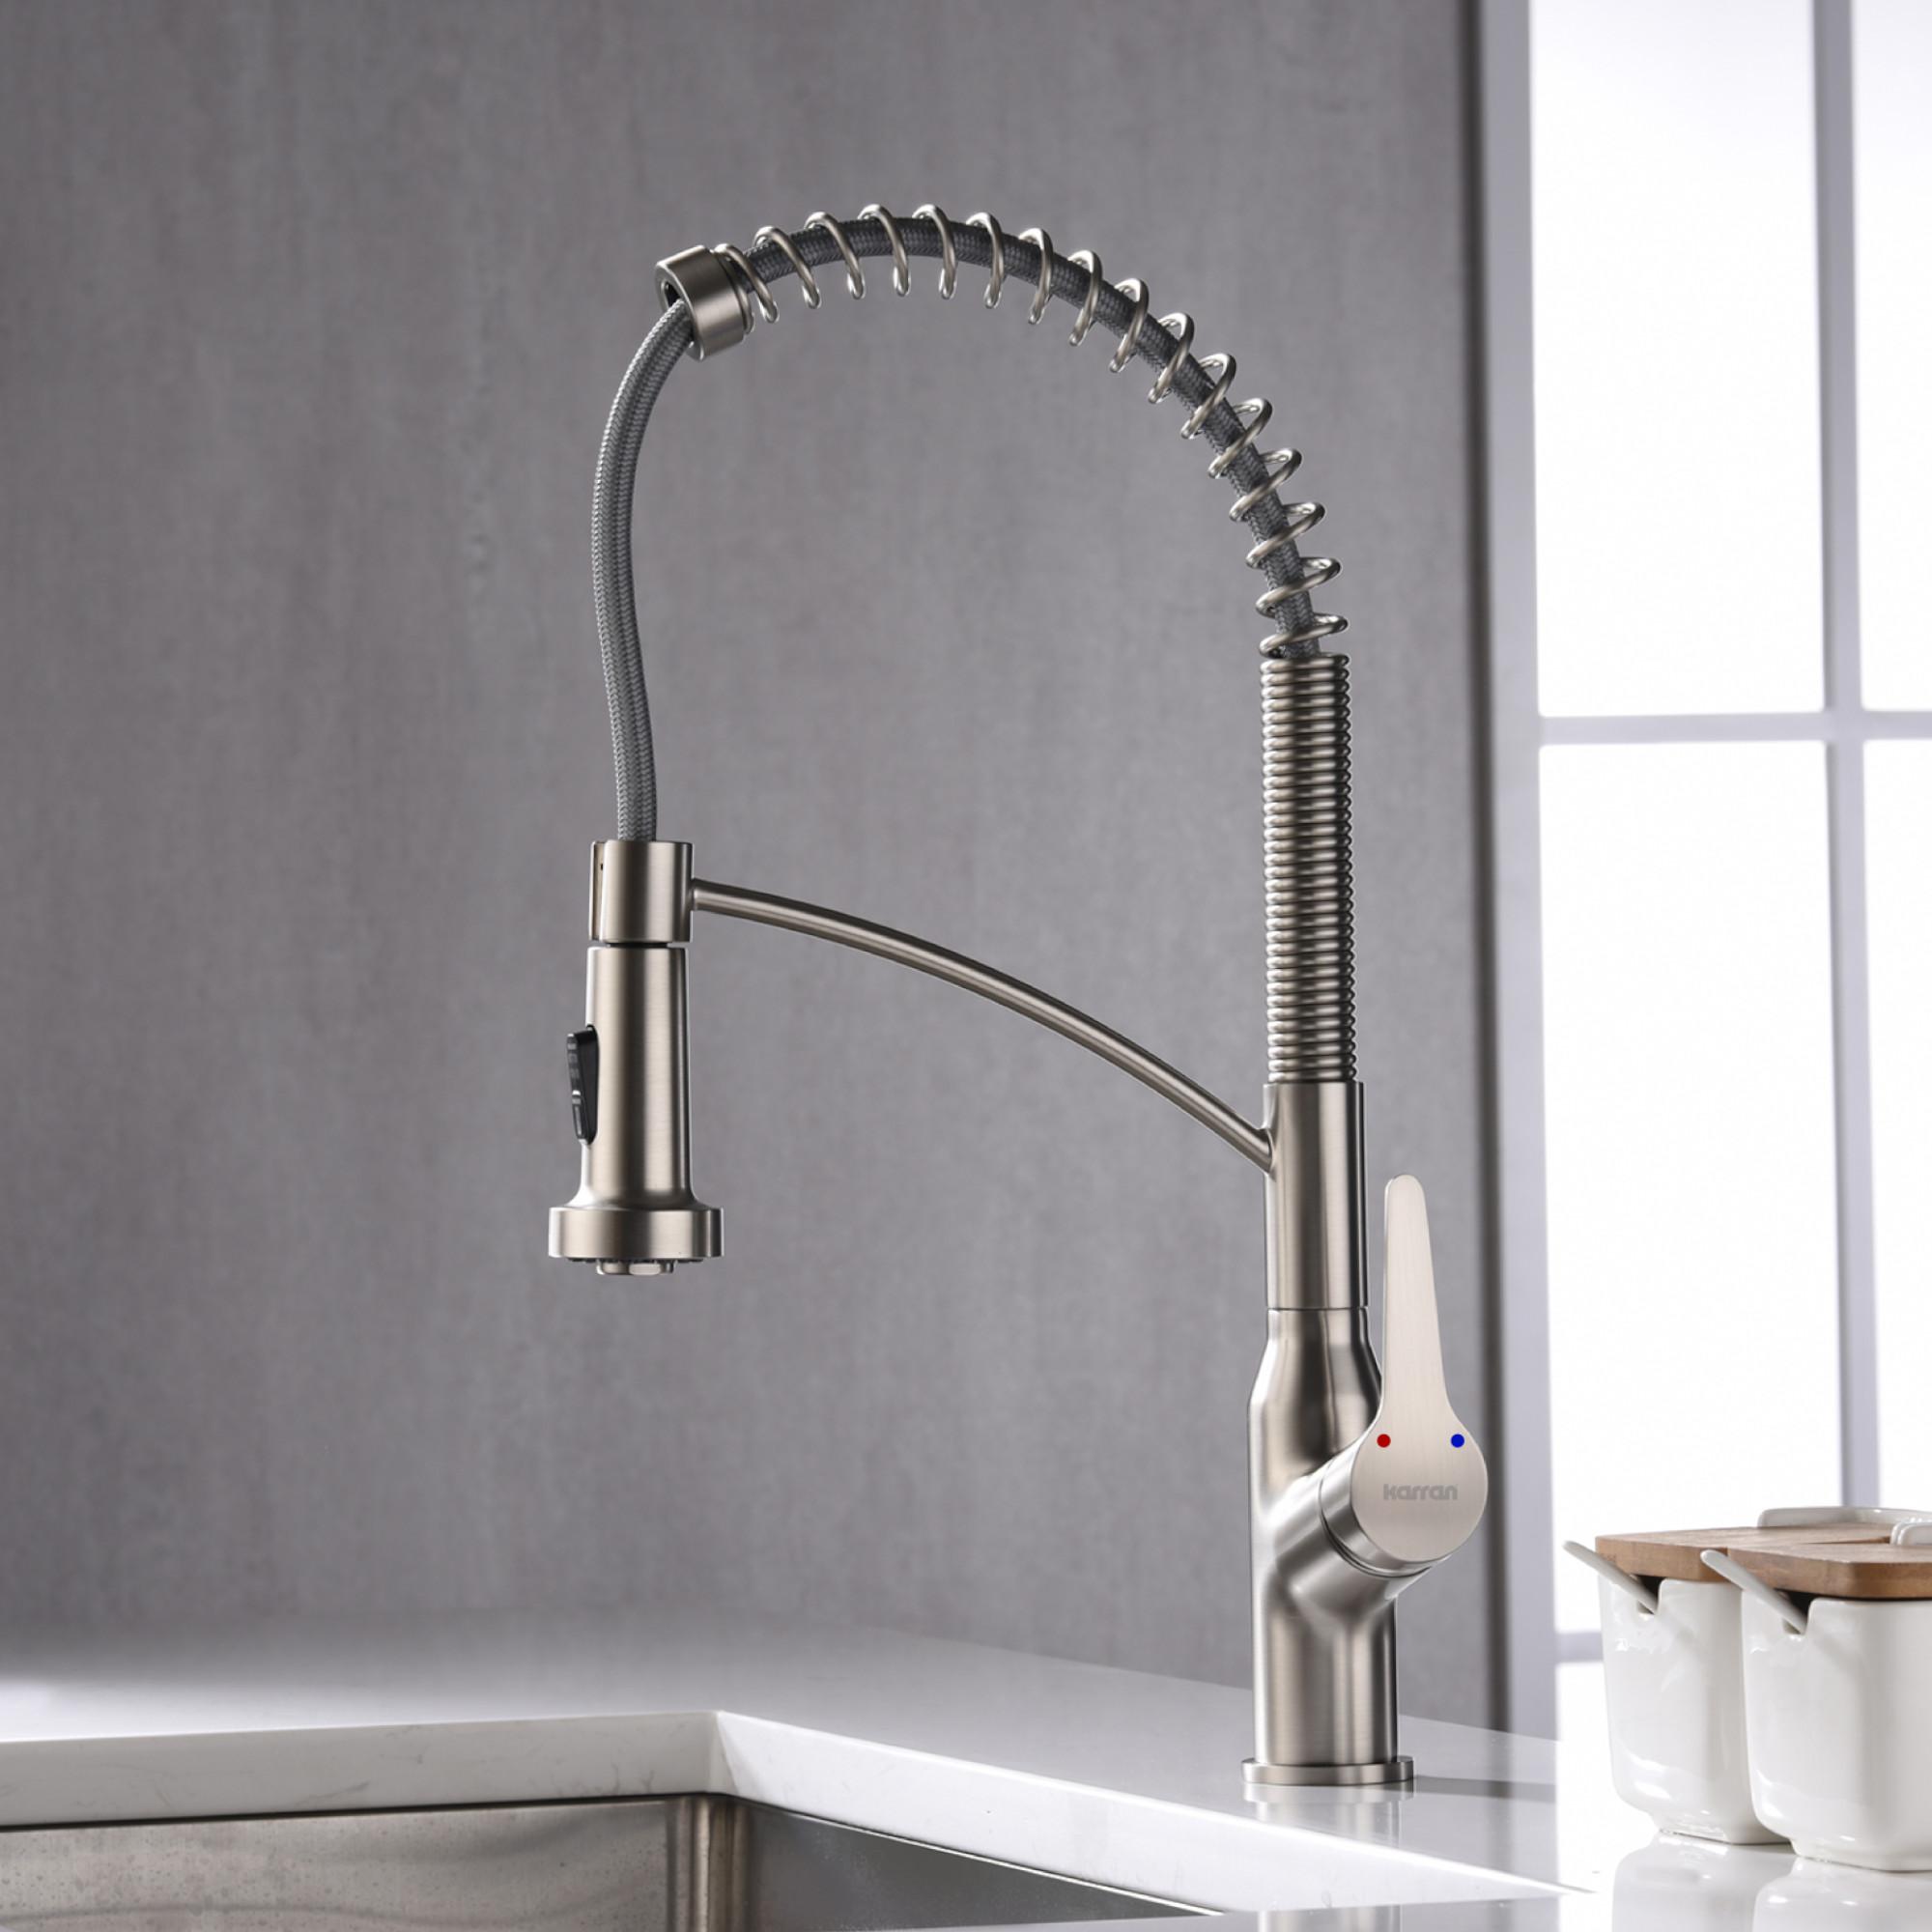 Karran Scottsdale Single Lever Handle Lead-free Brass ADA Kitchen Faucet, Pull Down, Stainless Steel, KKF210SS